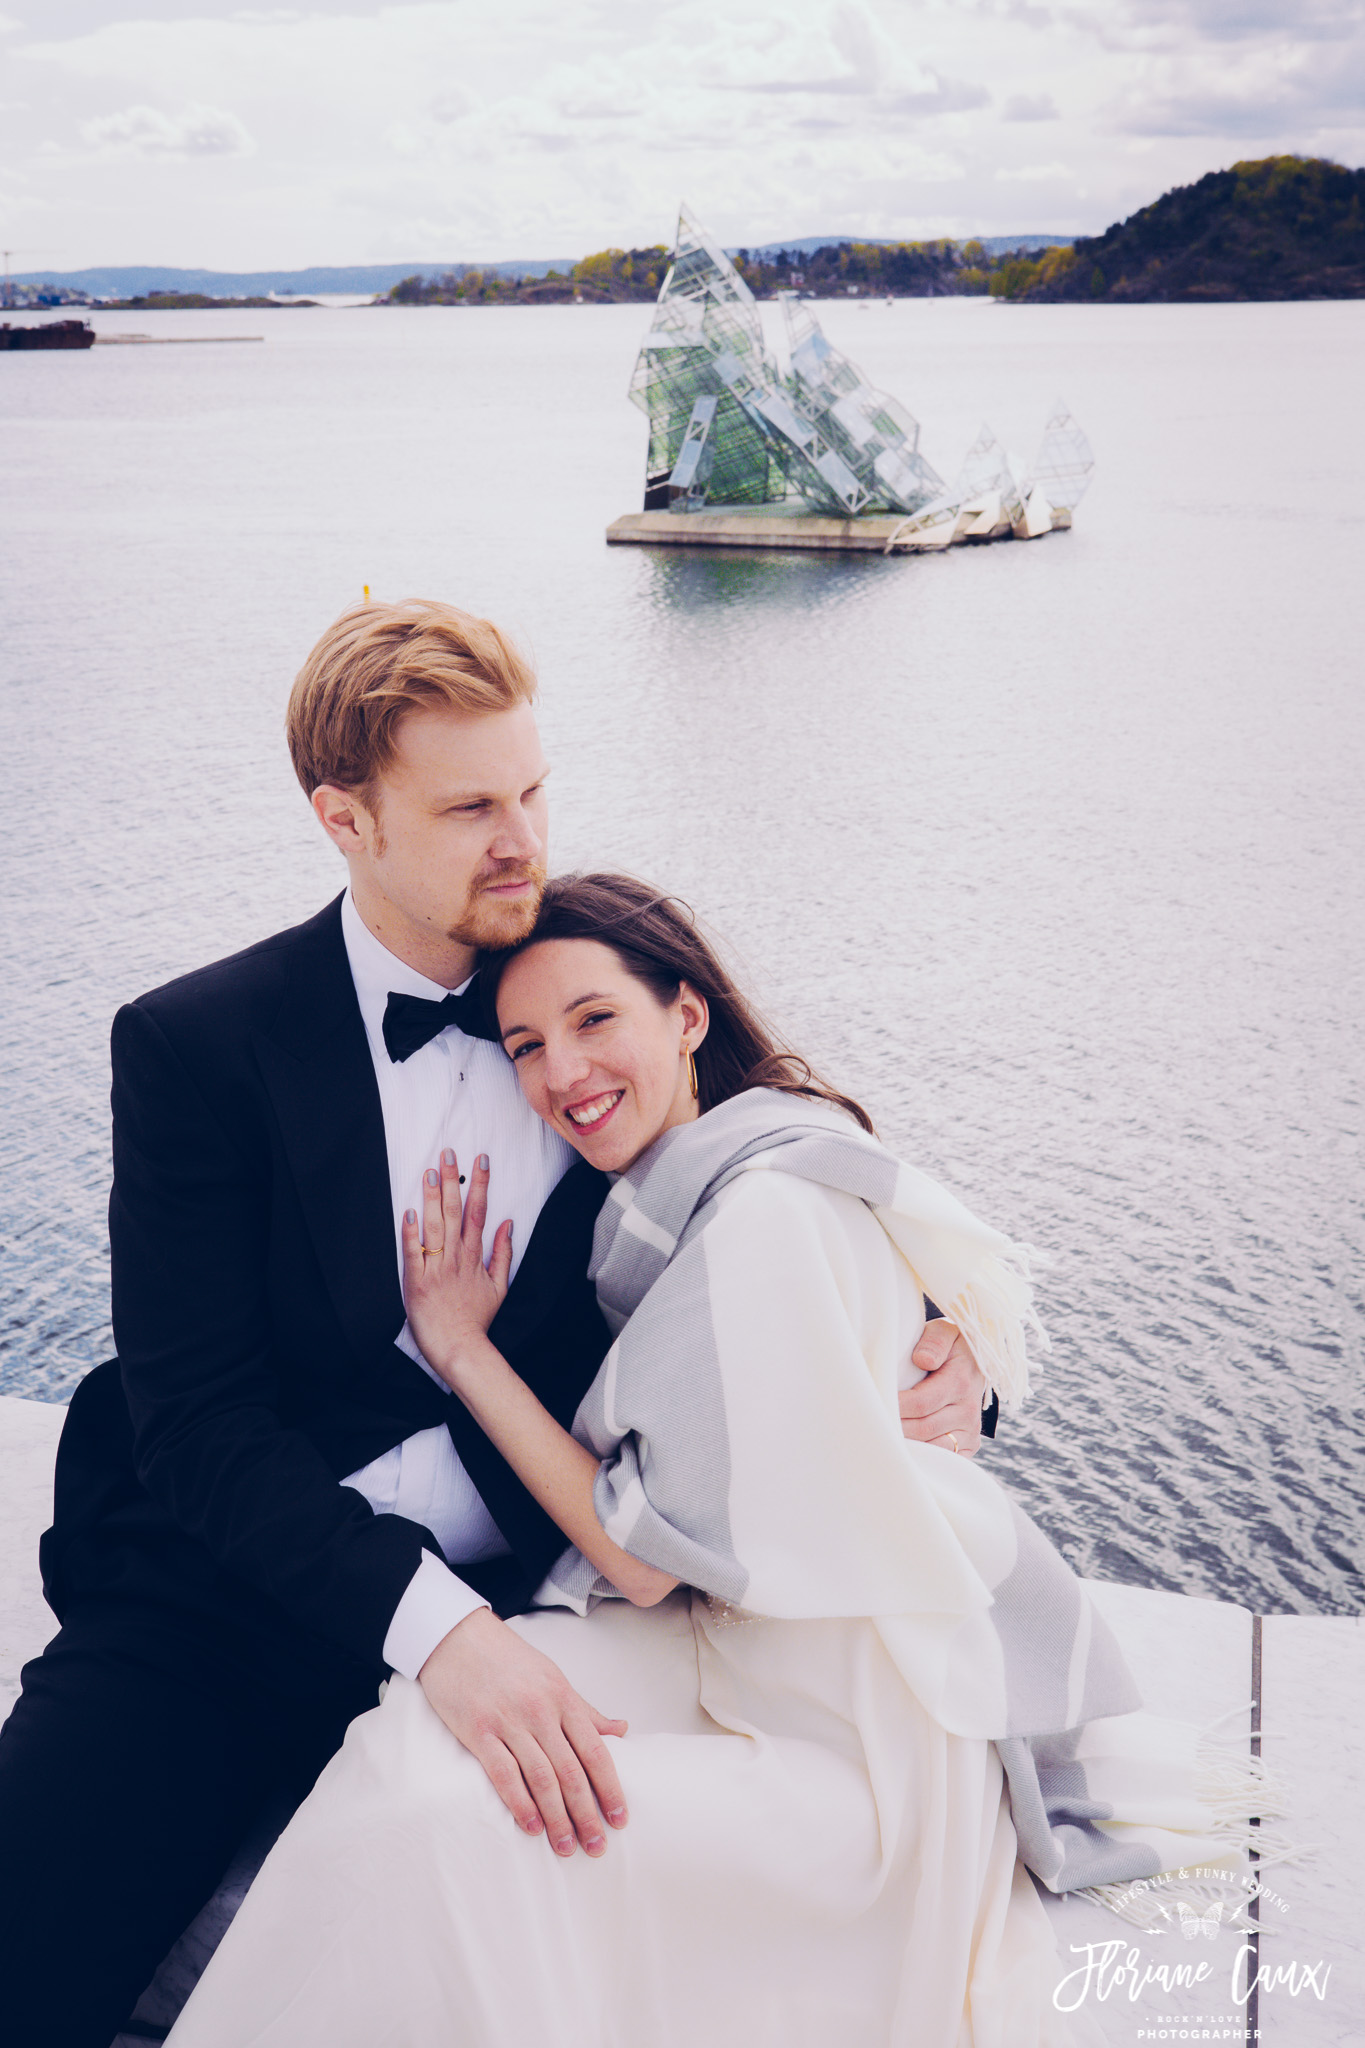 destination-wedding-photographer-oslo-norway-floriane-caux-65